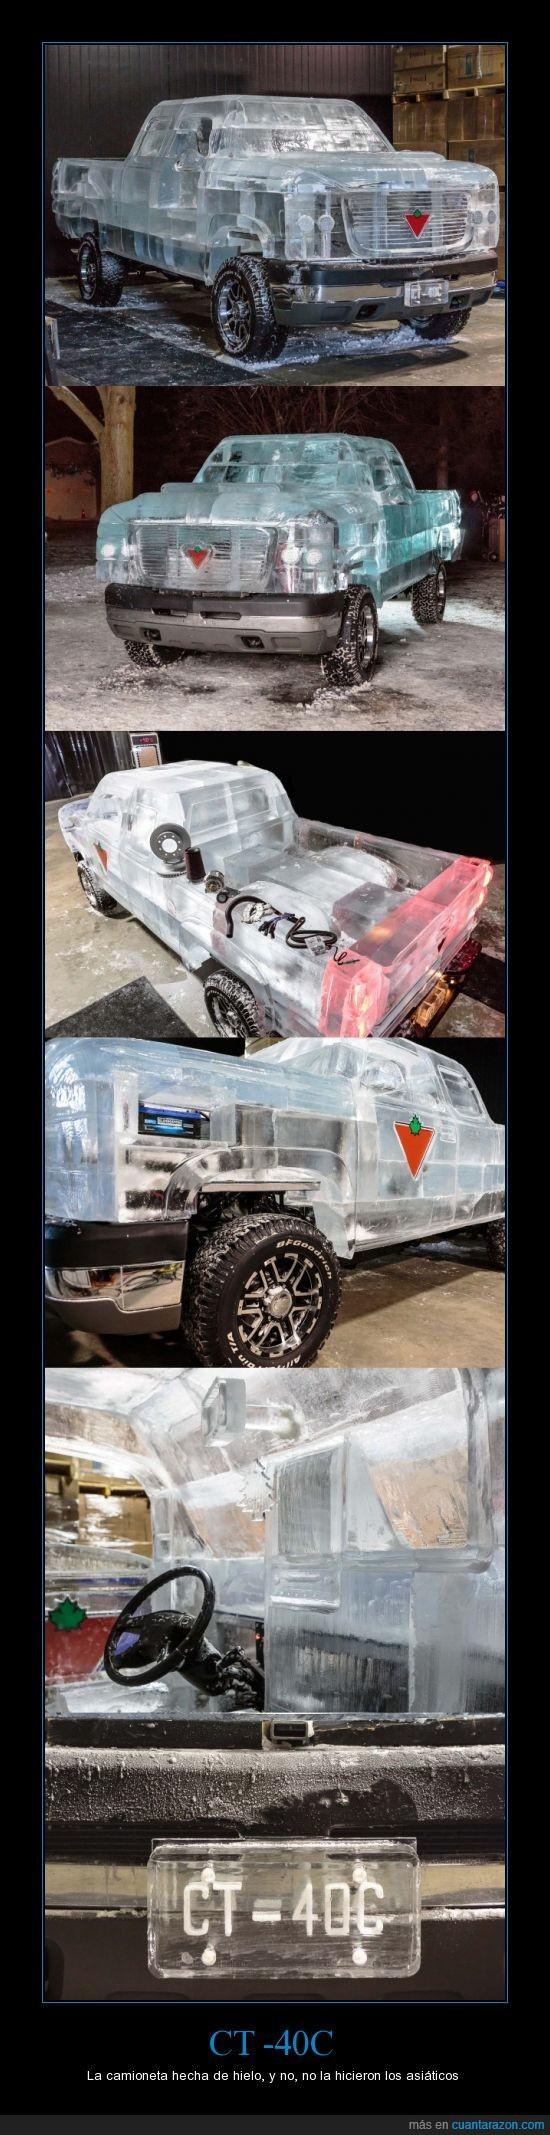 -40°,Bateria,Camioneta,Canadá,Comercial,CT -40C,Frio,Hielo